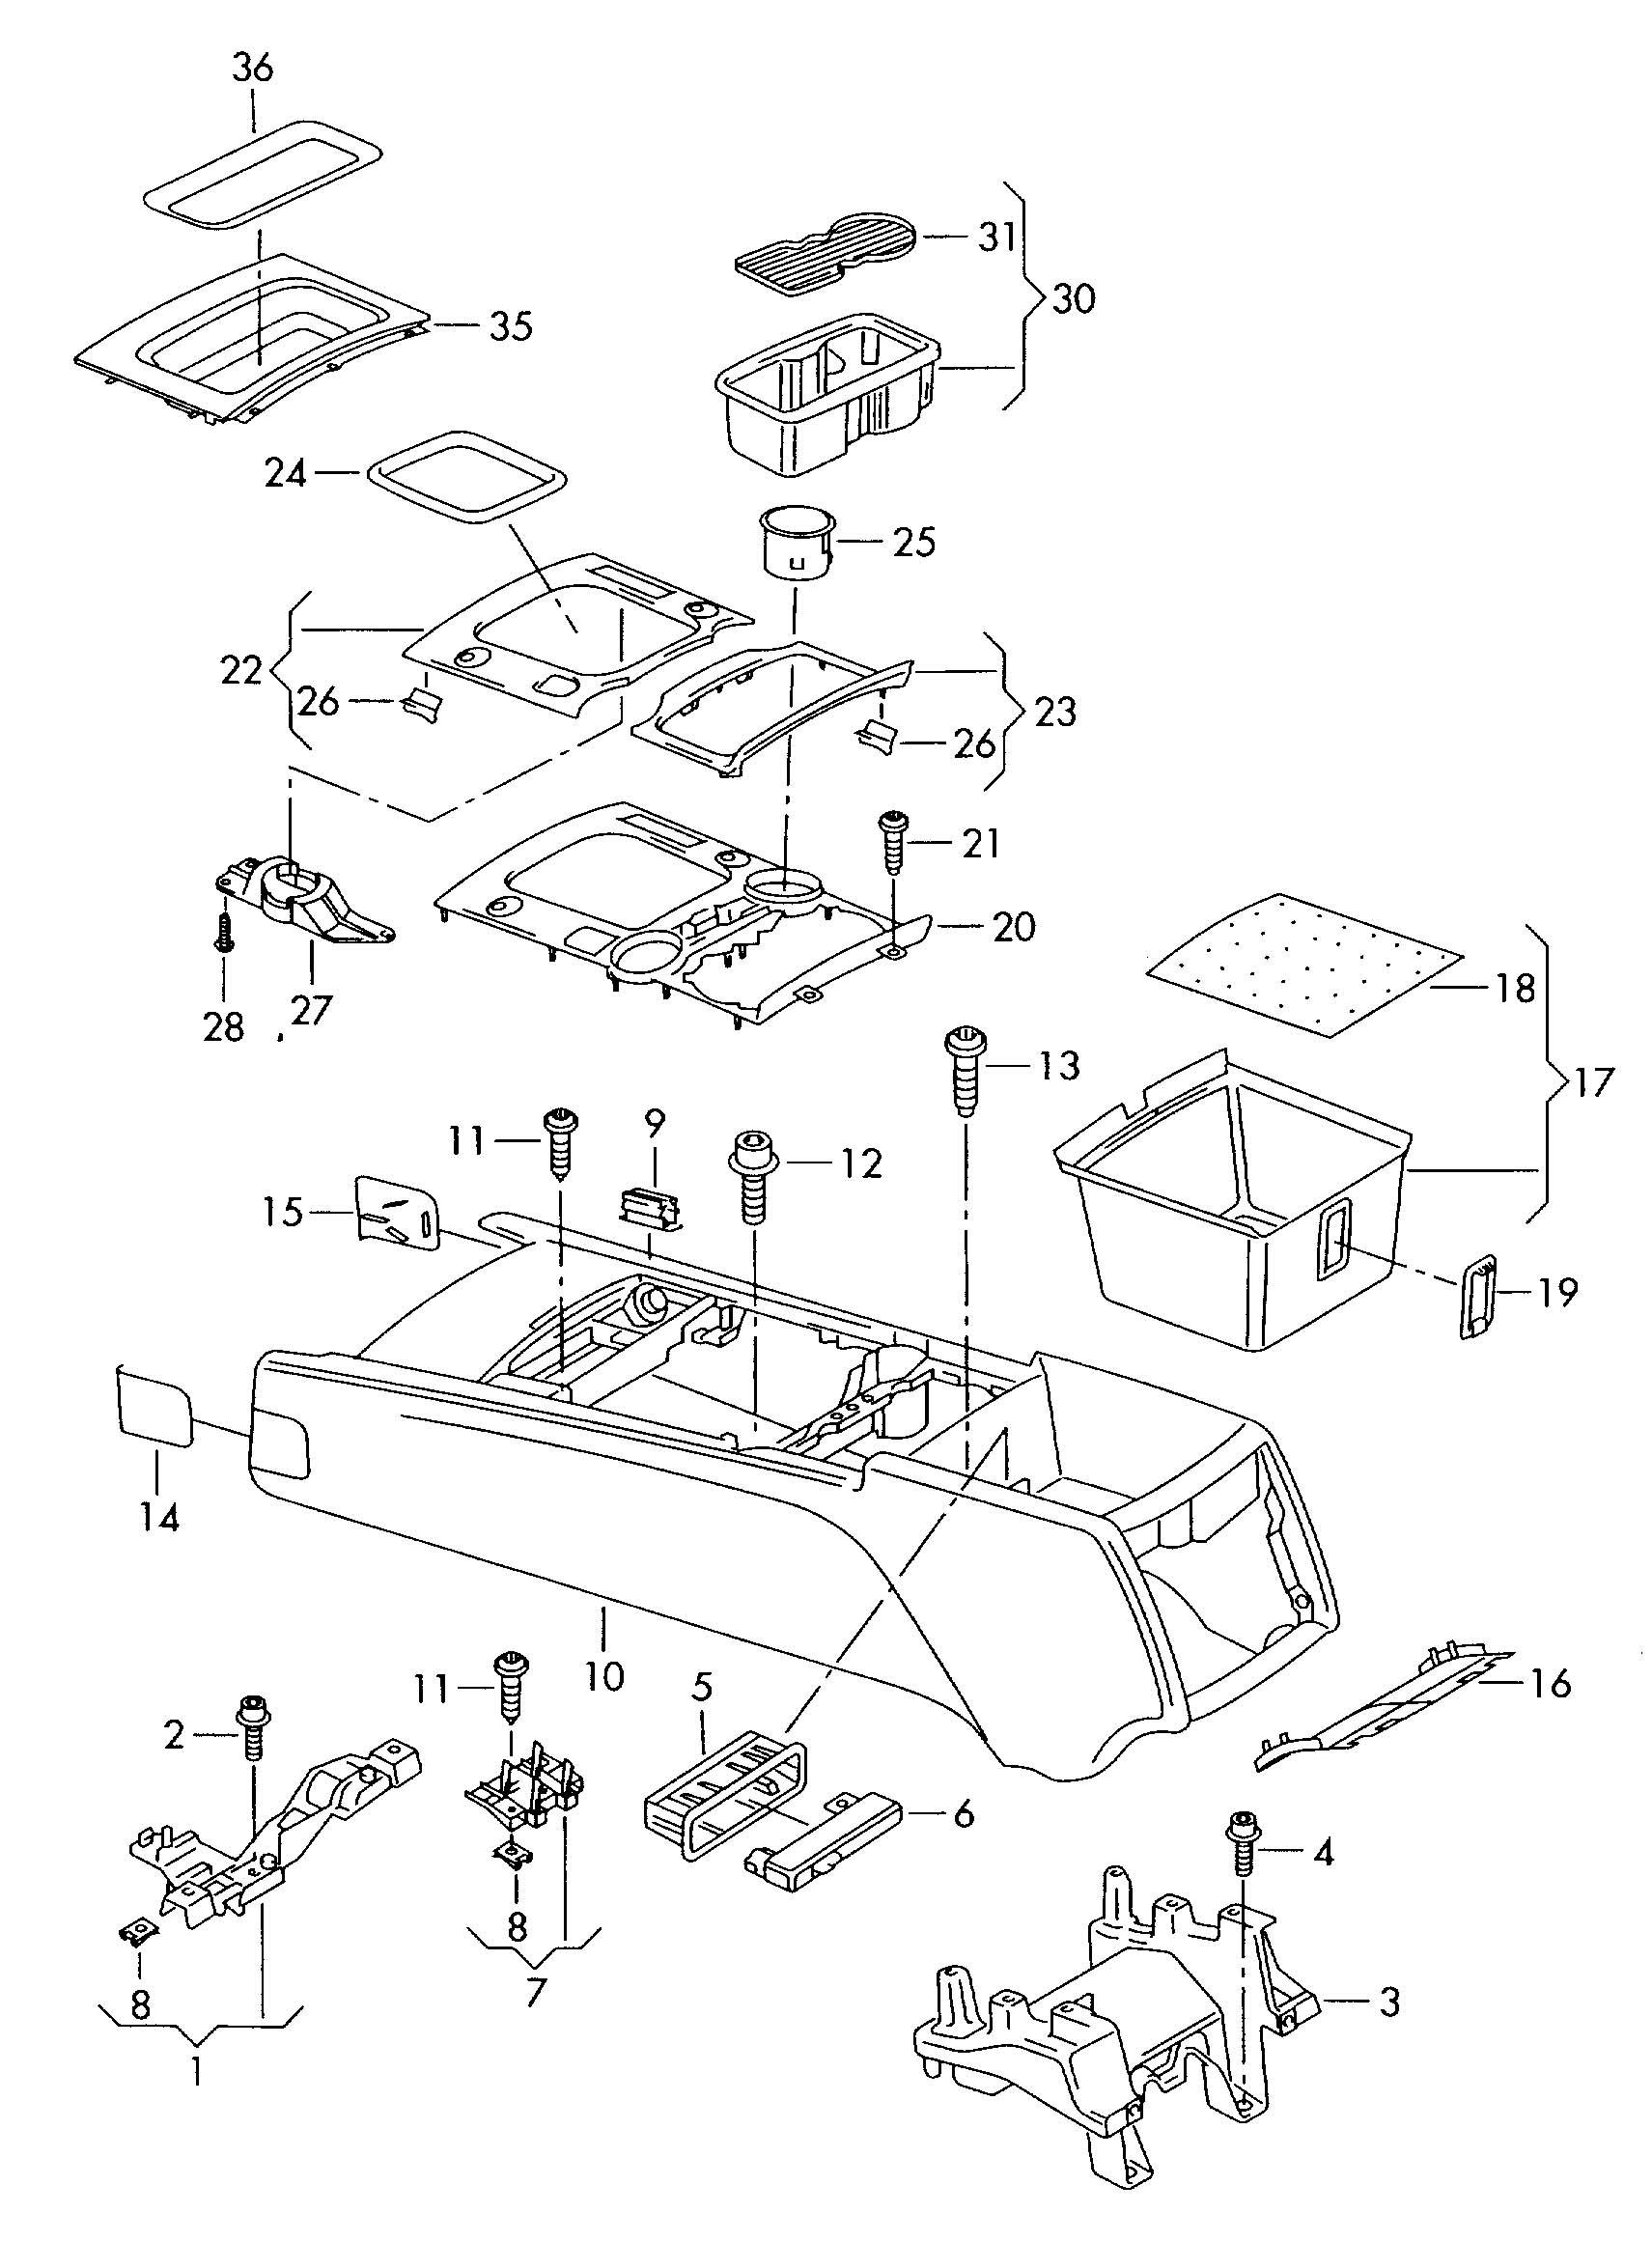 Vw Eos Parts Chart. Diagrams. Wiring Diagram Gallery